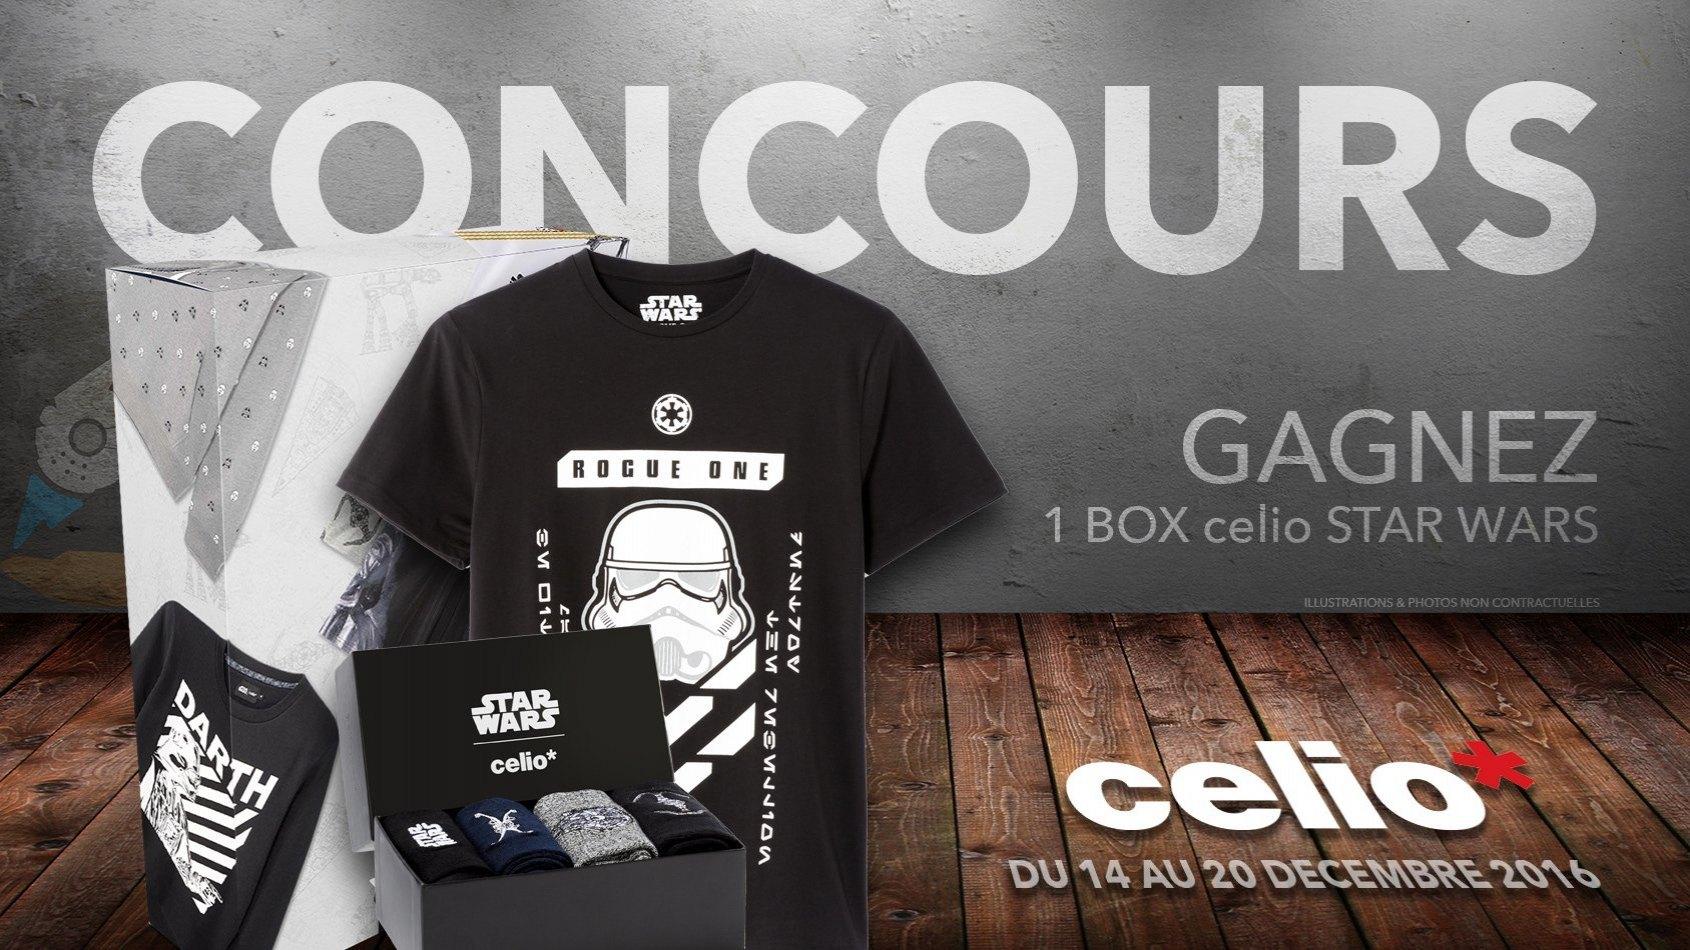 CONCOURS - Gagnez une box celio Star Wars